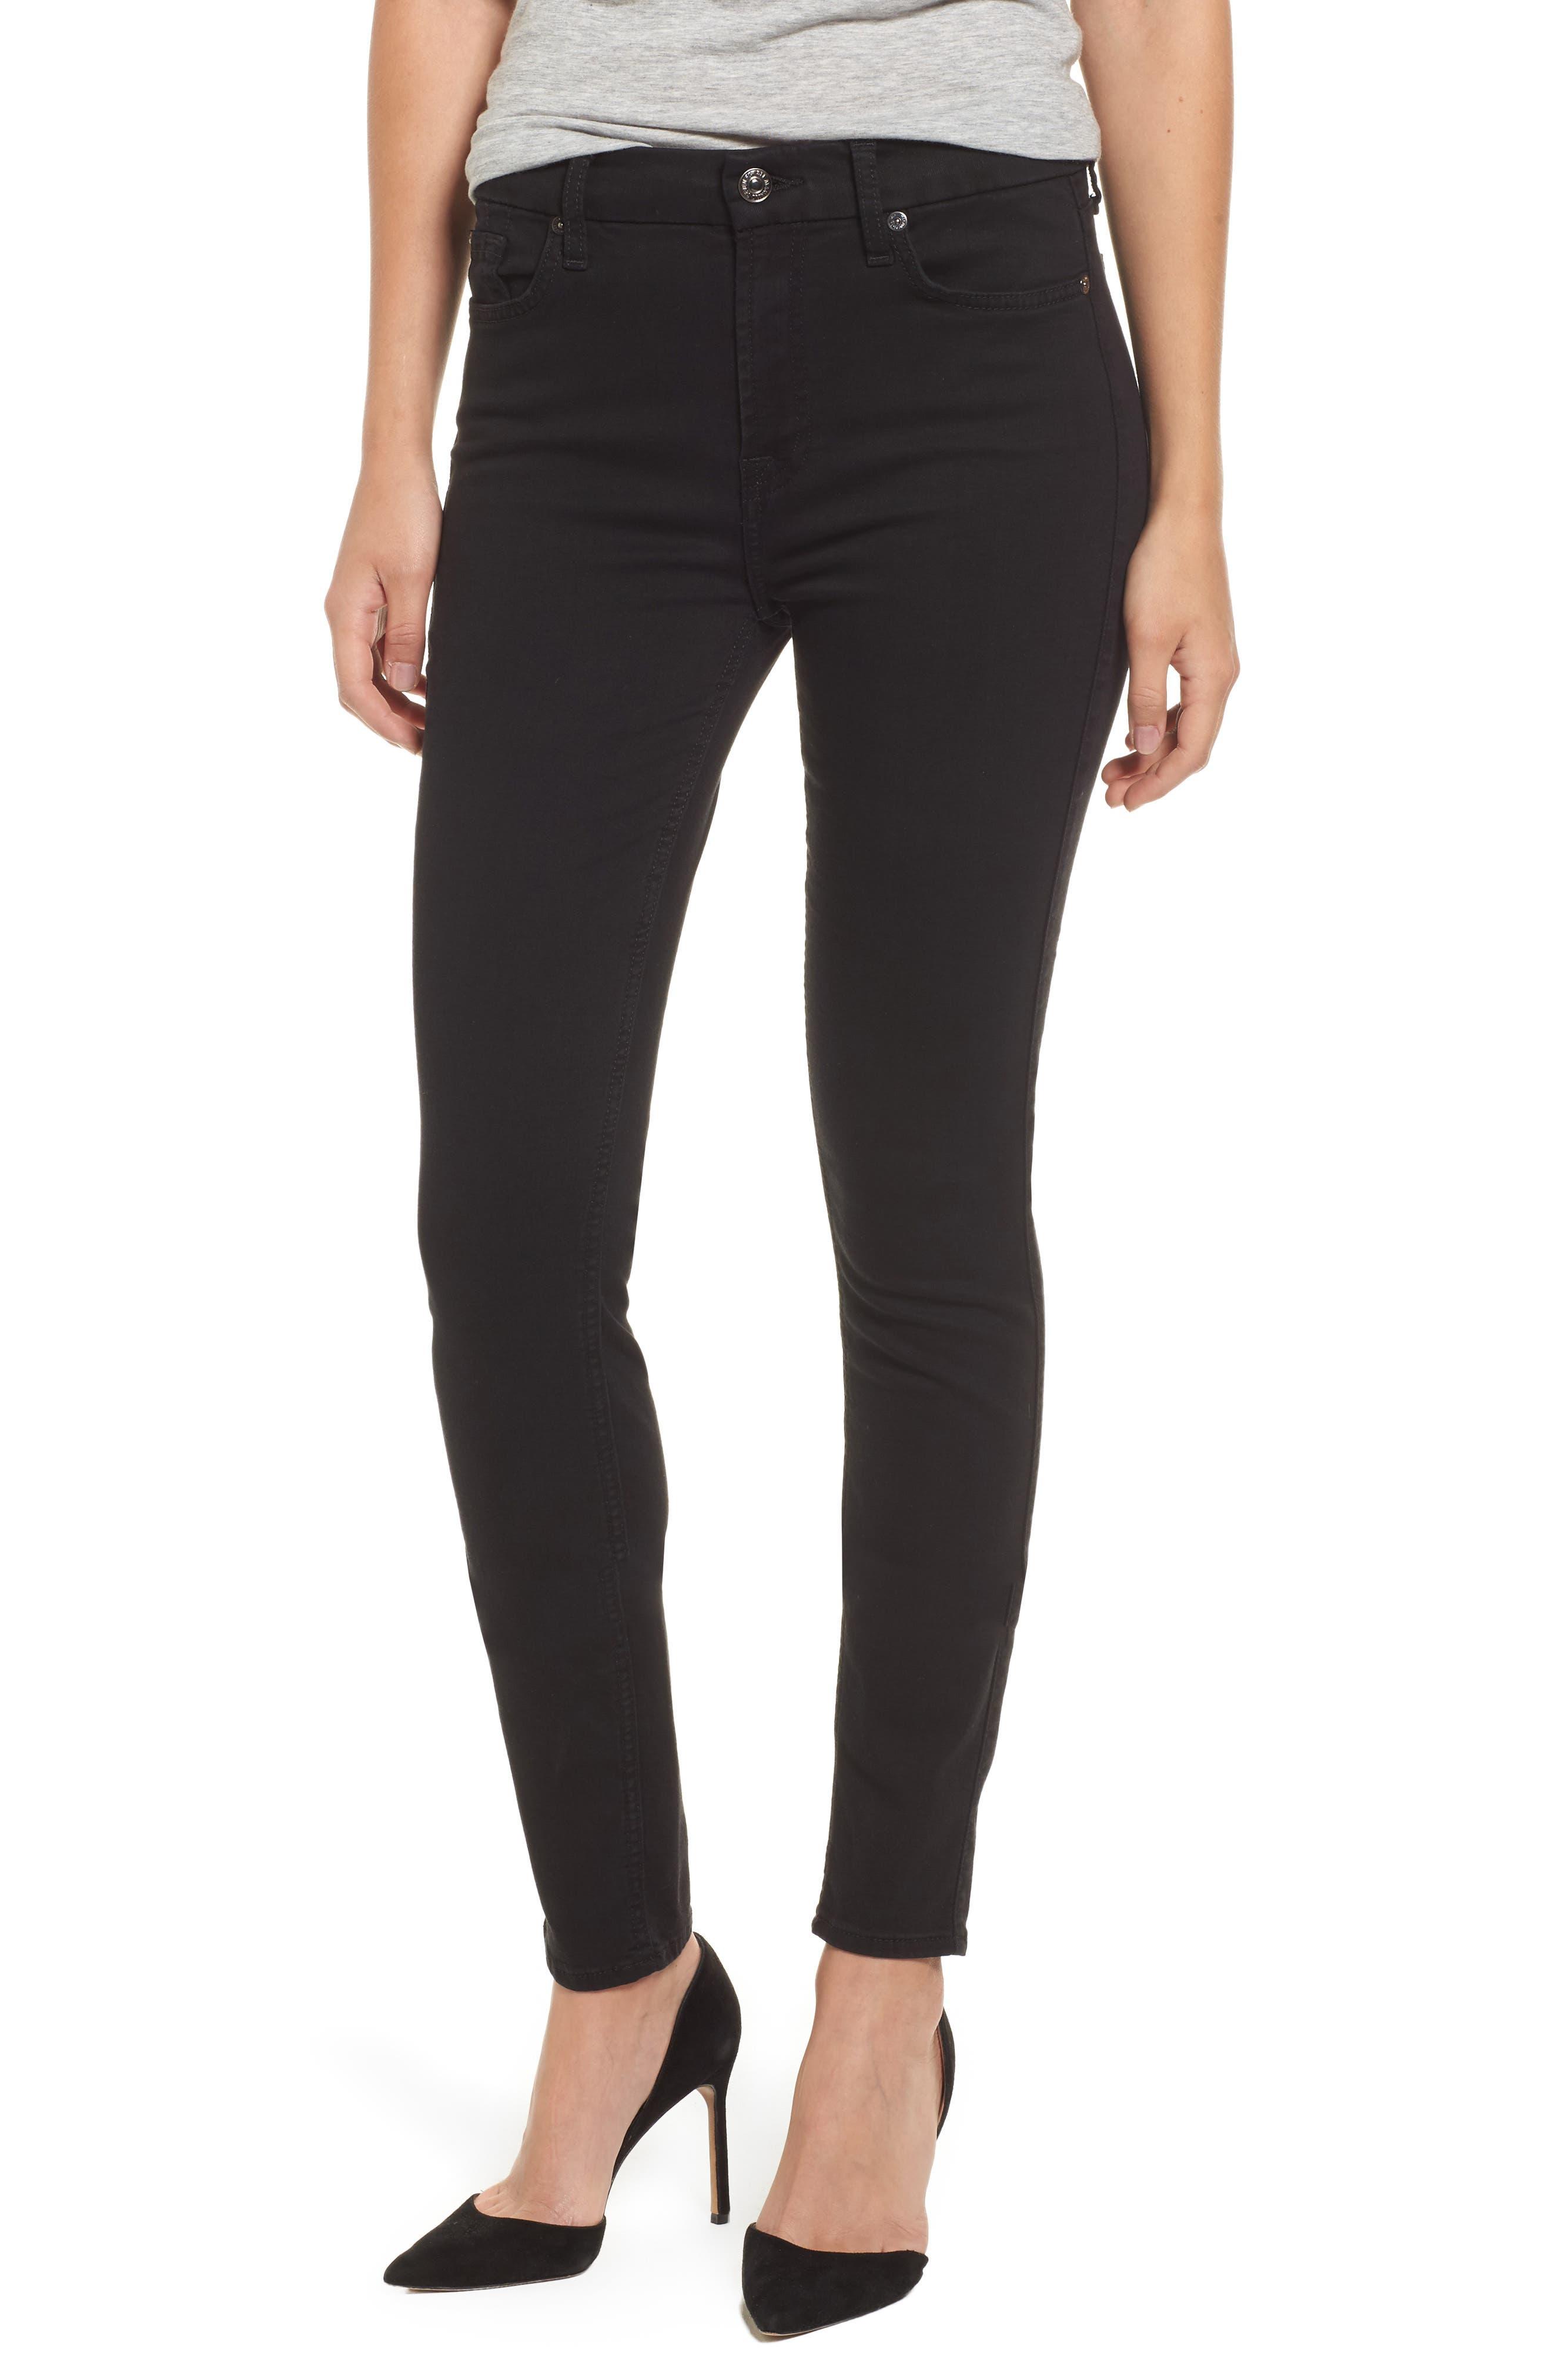 Alternate Image 1 Selected - 7 For All Mankind® b(air) High Waist Skinny Jeans (Bair Black)